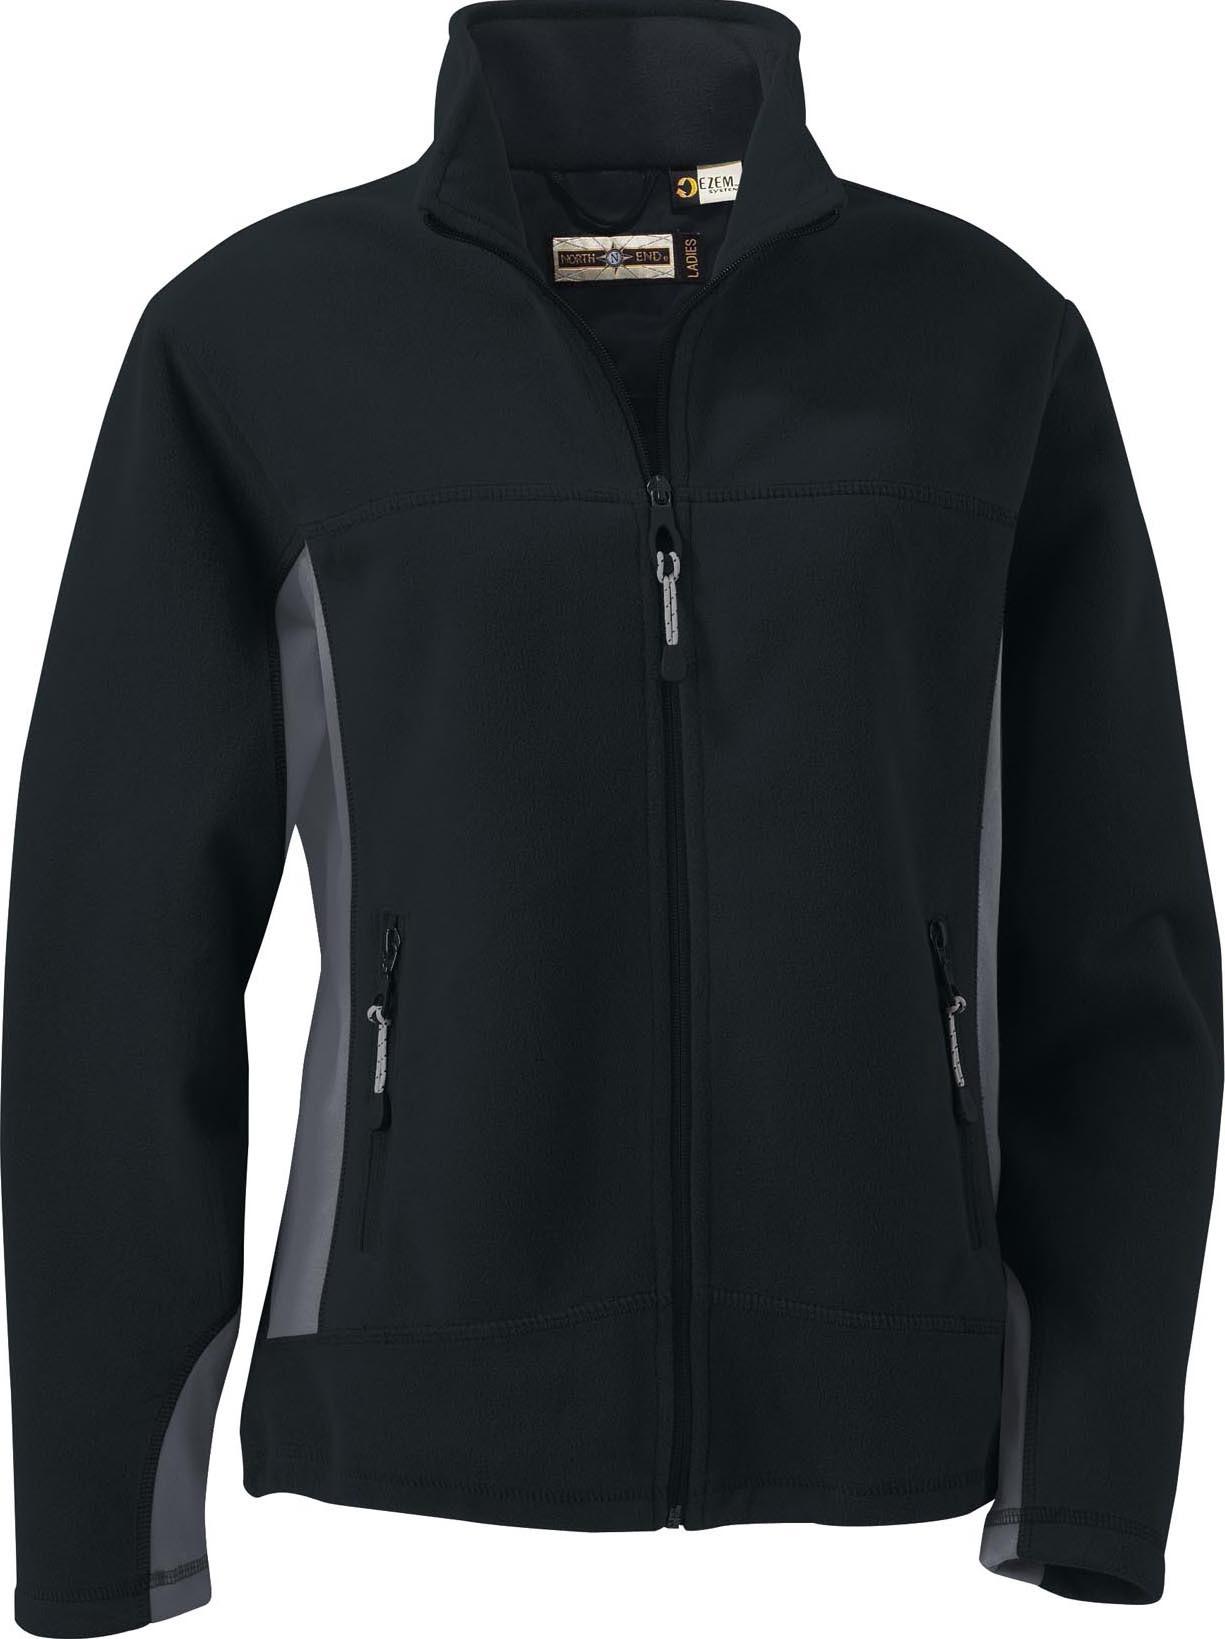 Ash City Bonded Fleece 78036 - Ladies' Fleece Bonded ...